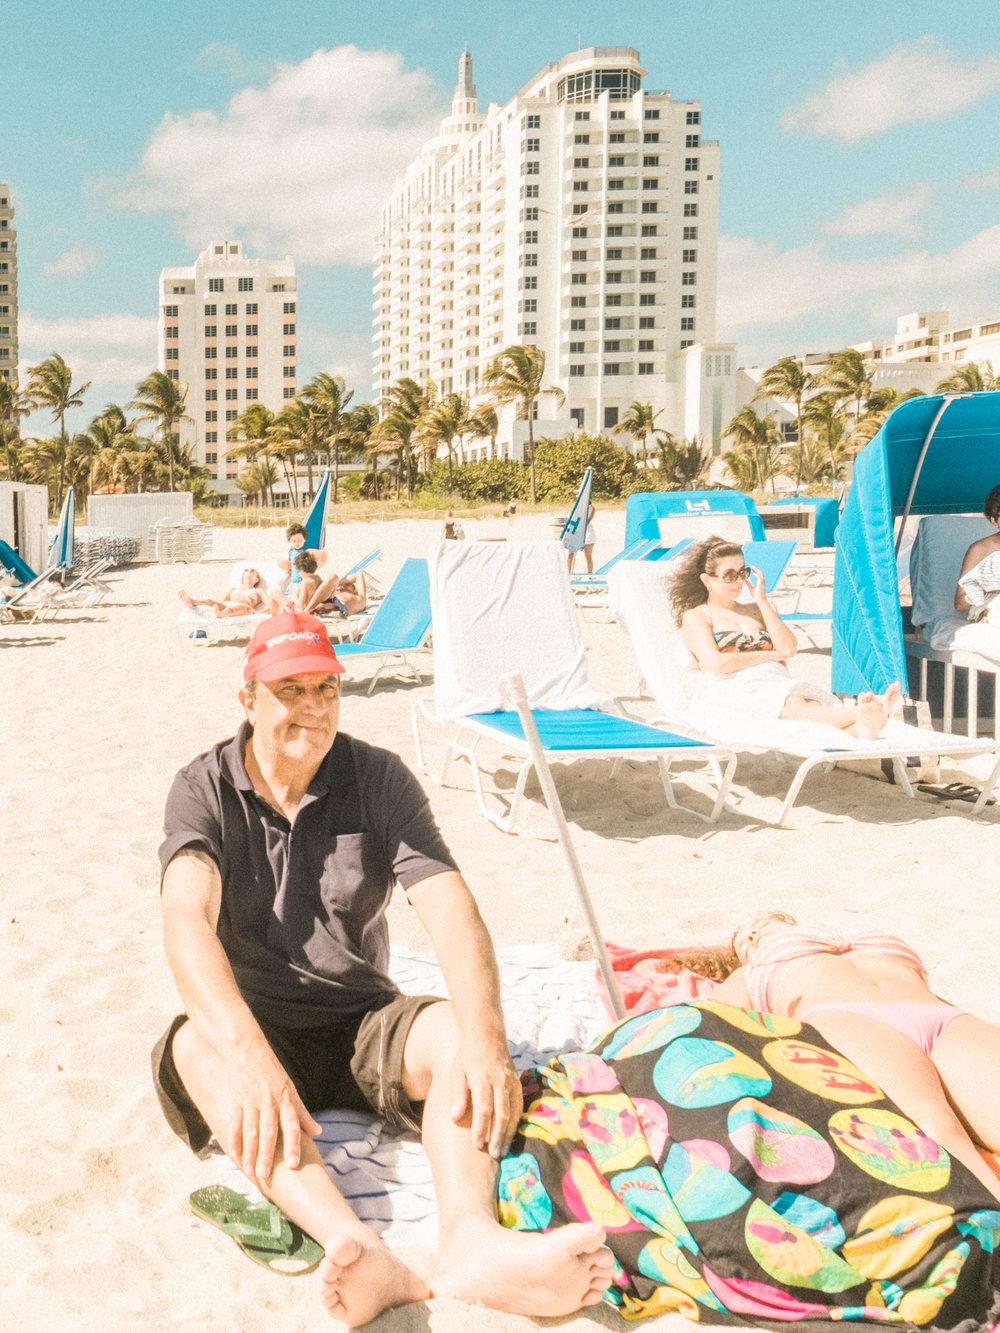 Miami_Beach_Street_76.jpg